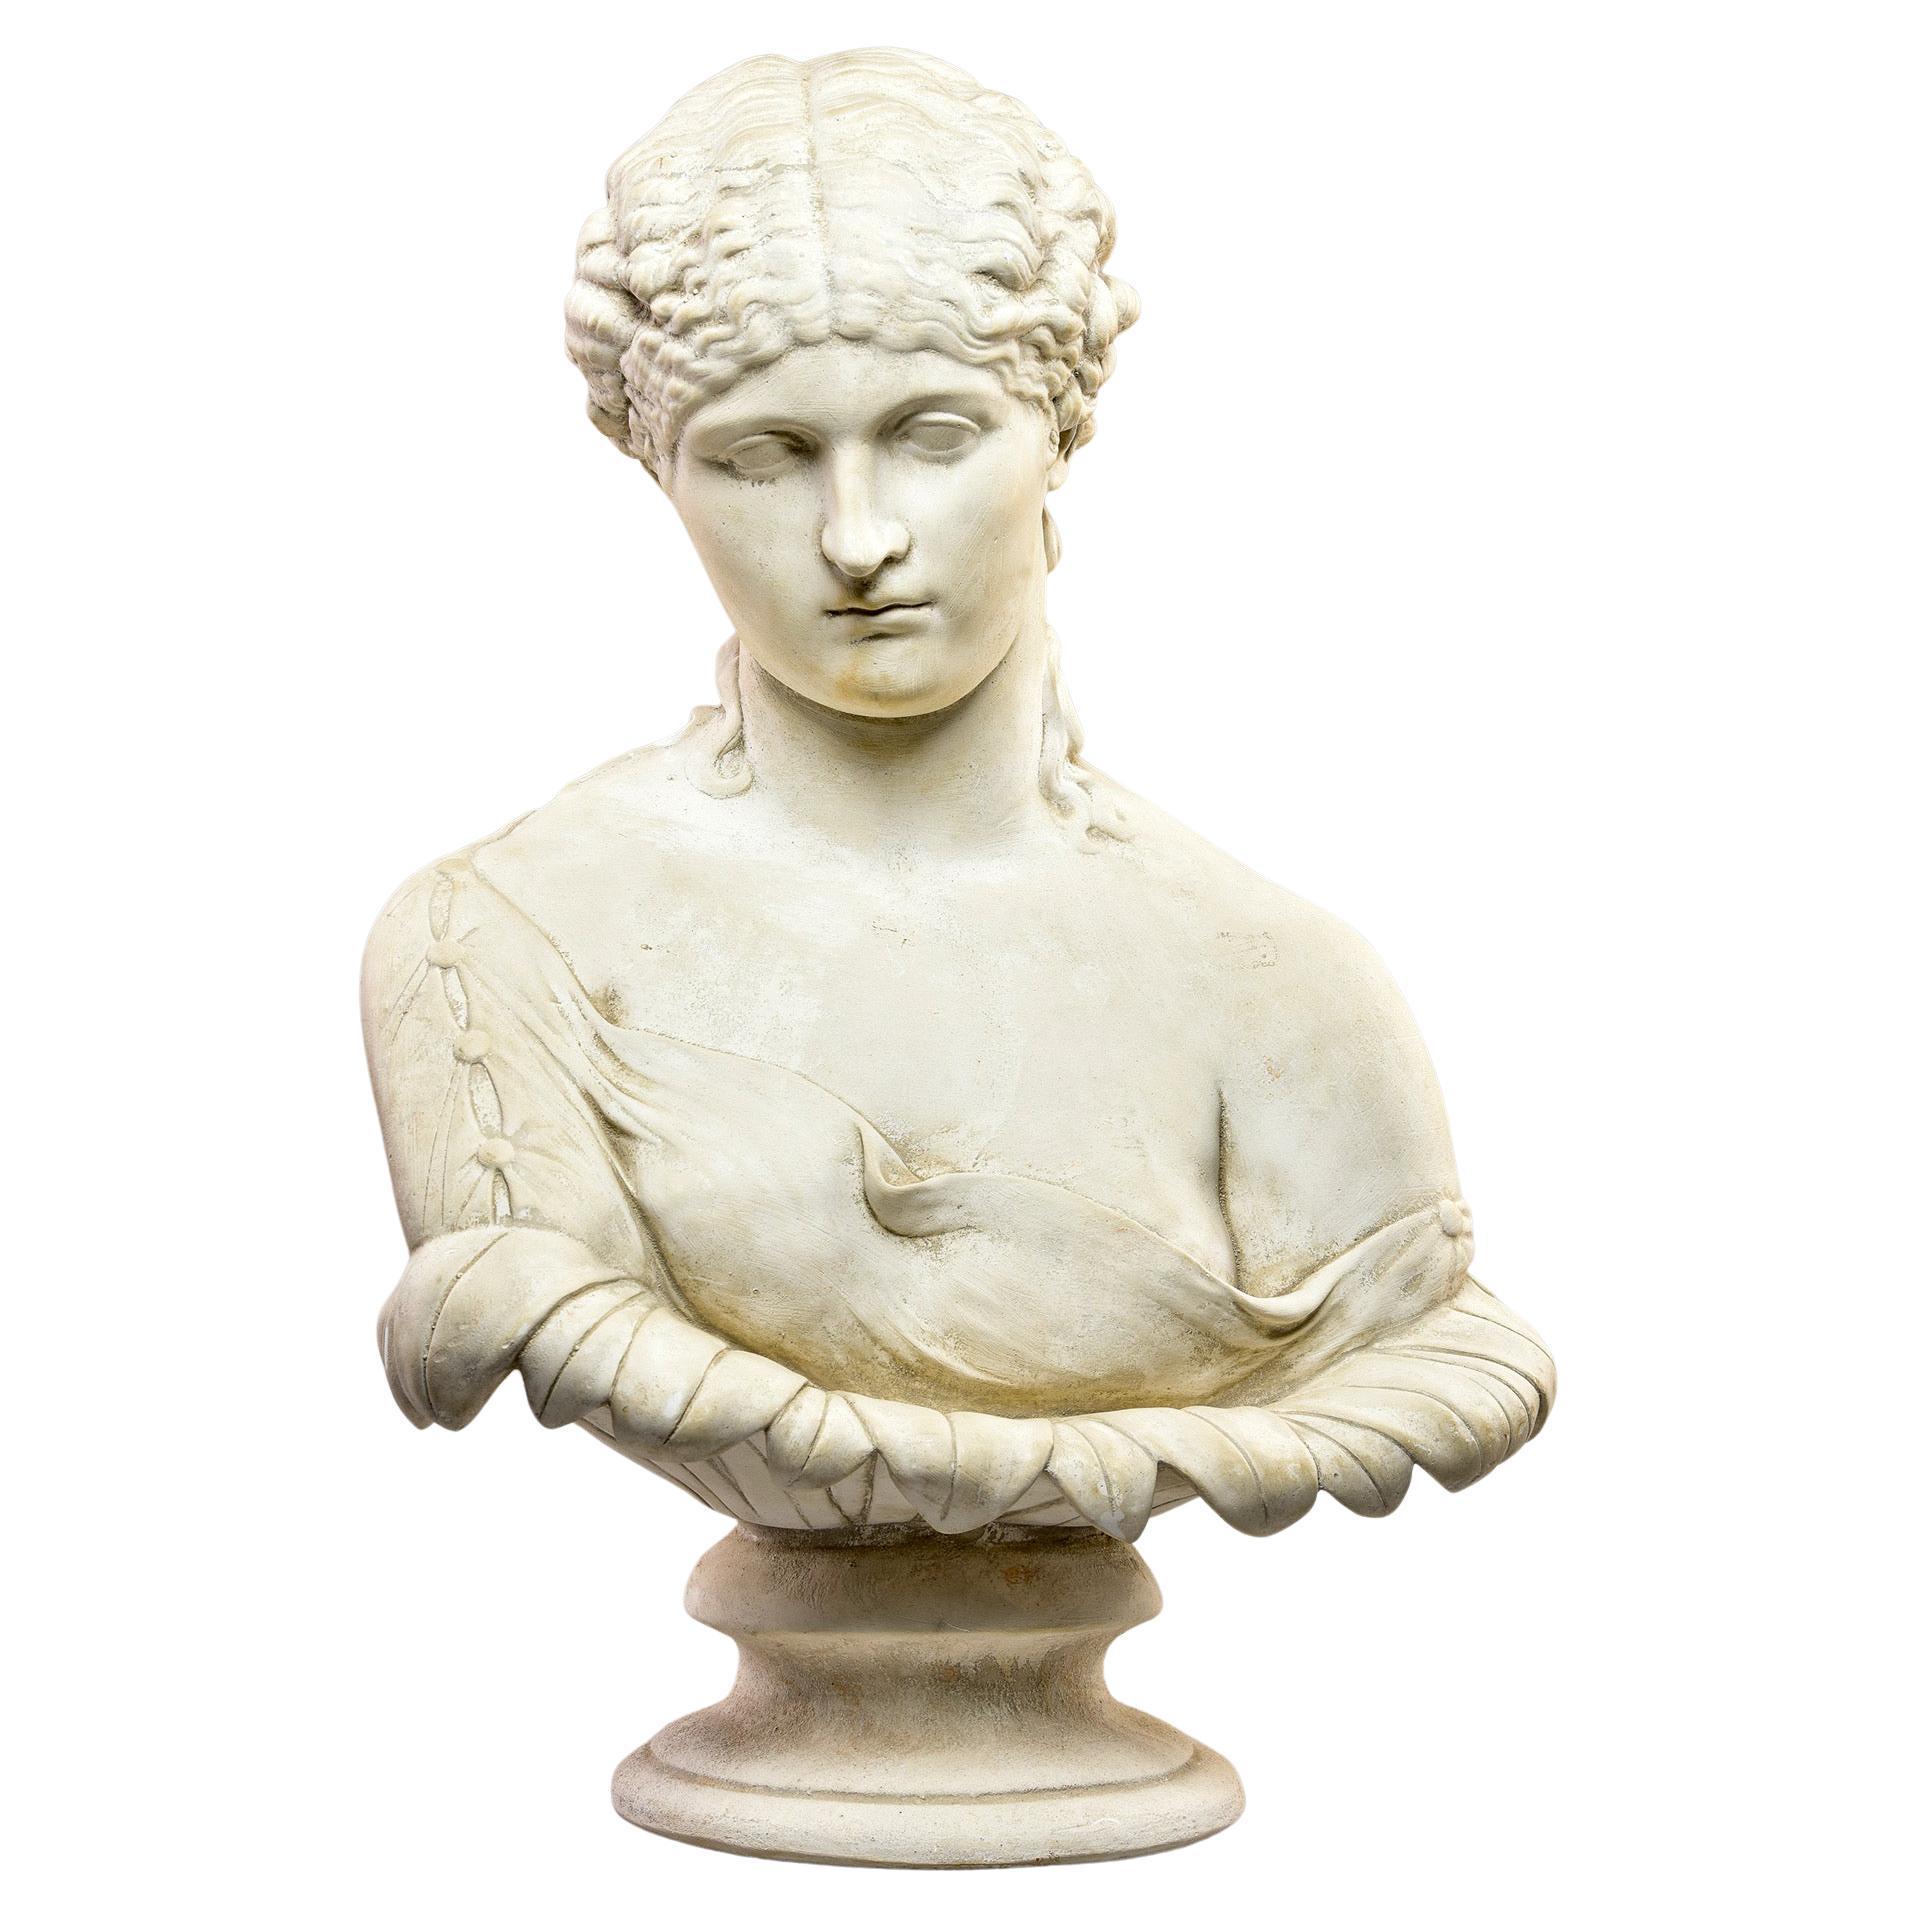 Bust of Classical Greek Female Figure